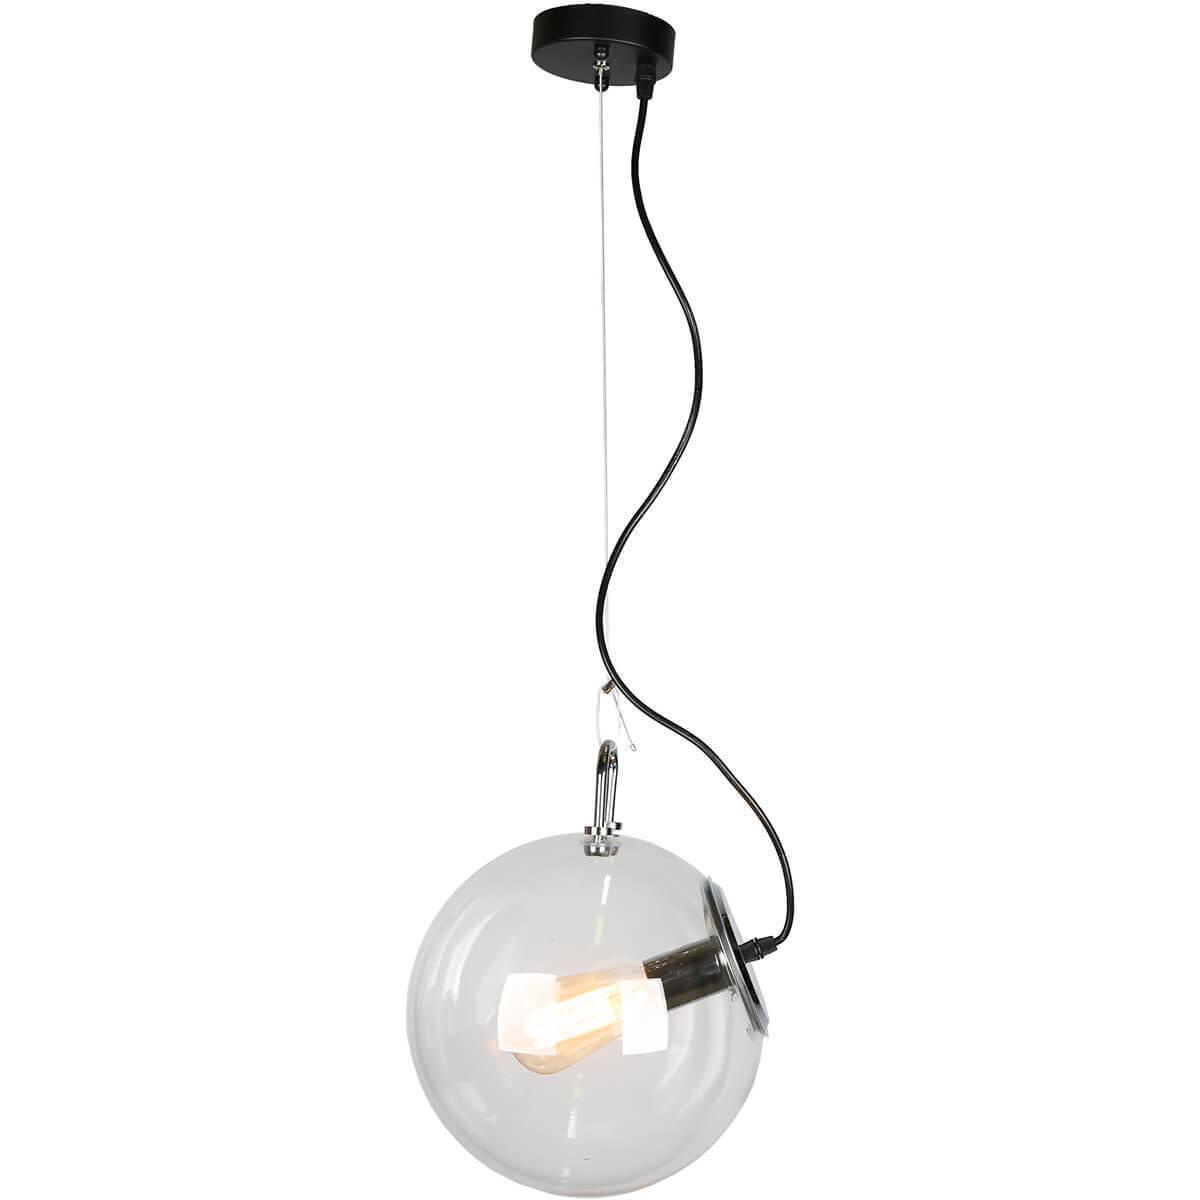 Подвесной светильник Omnilux OML-91406-01, E27, 60 Вт